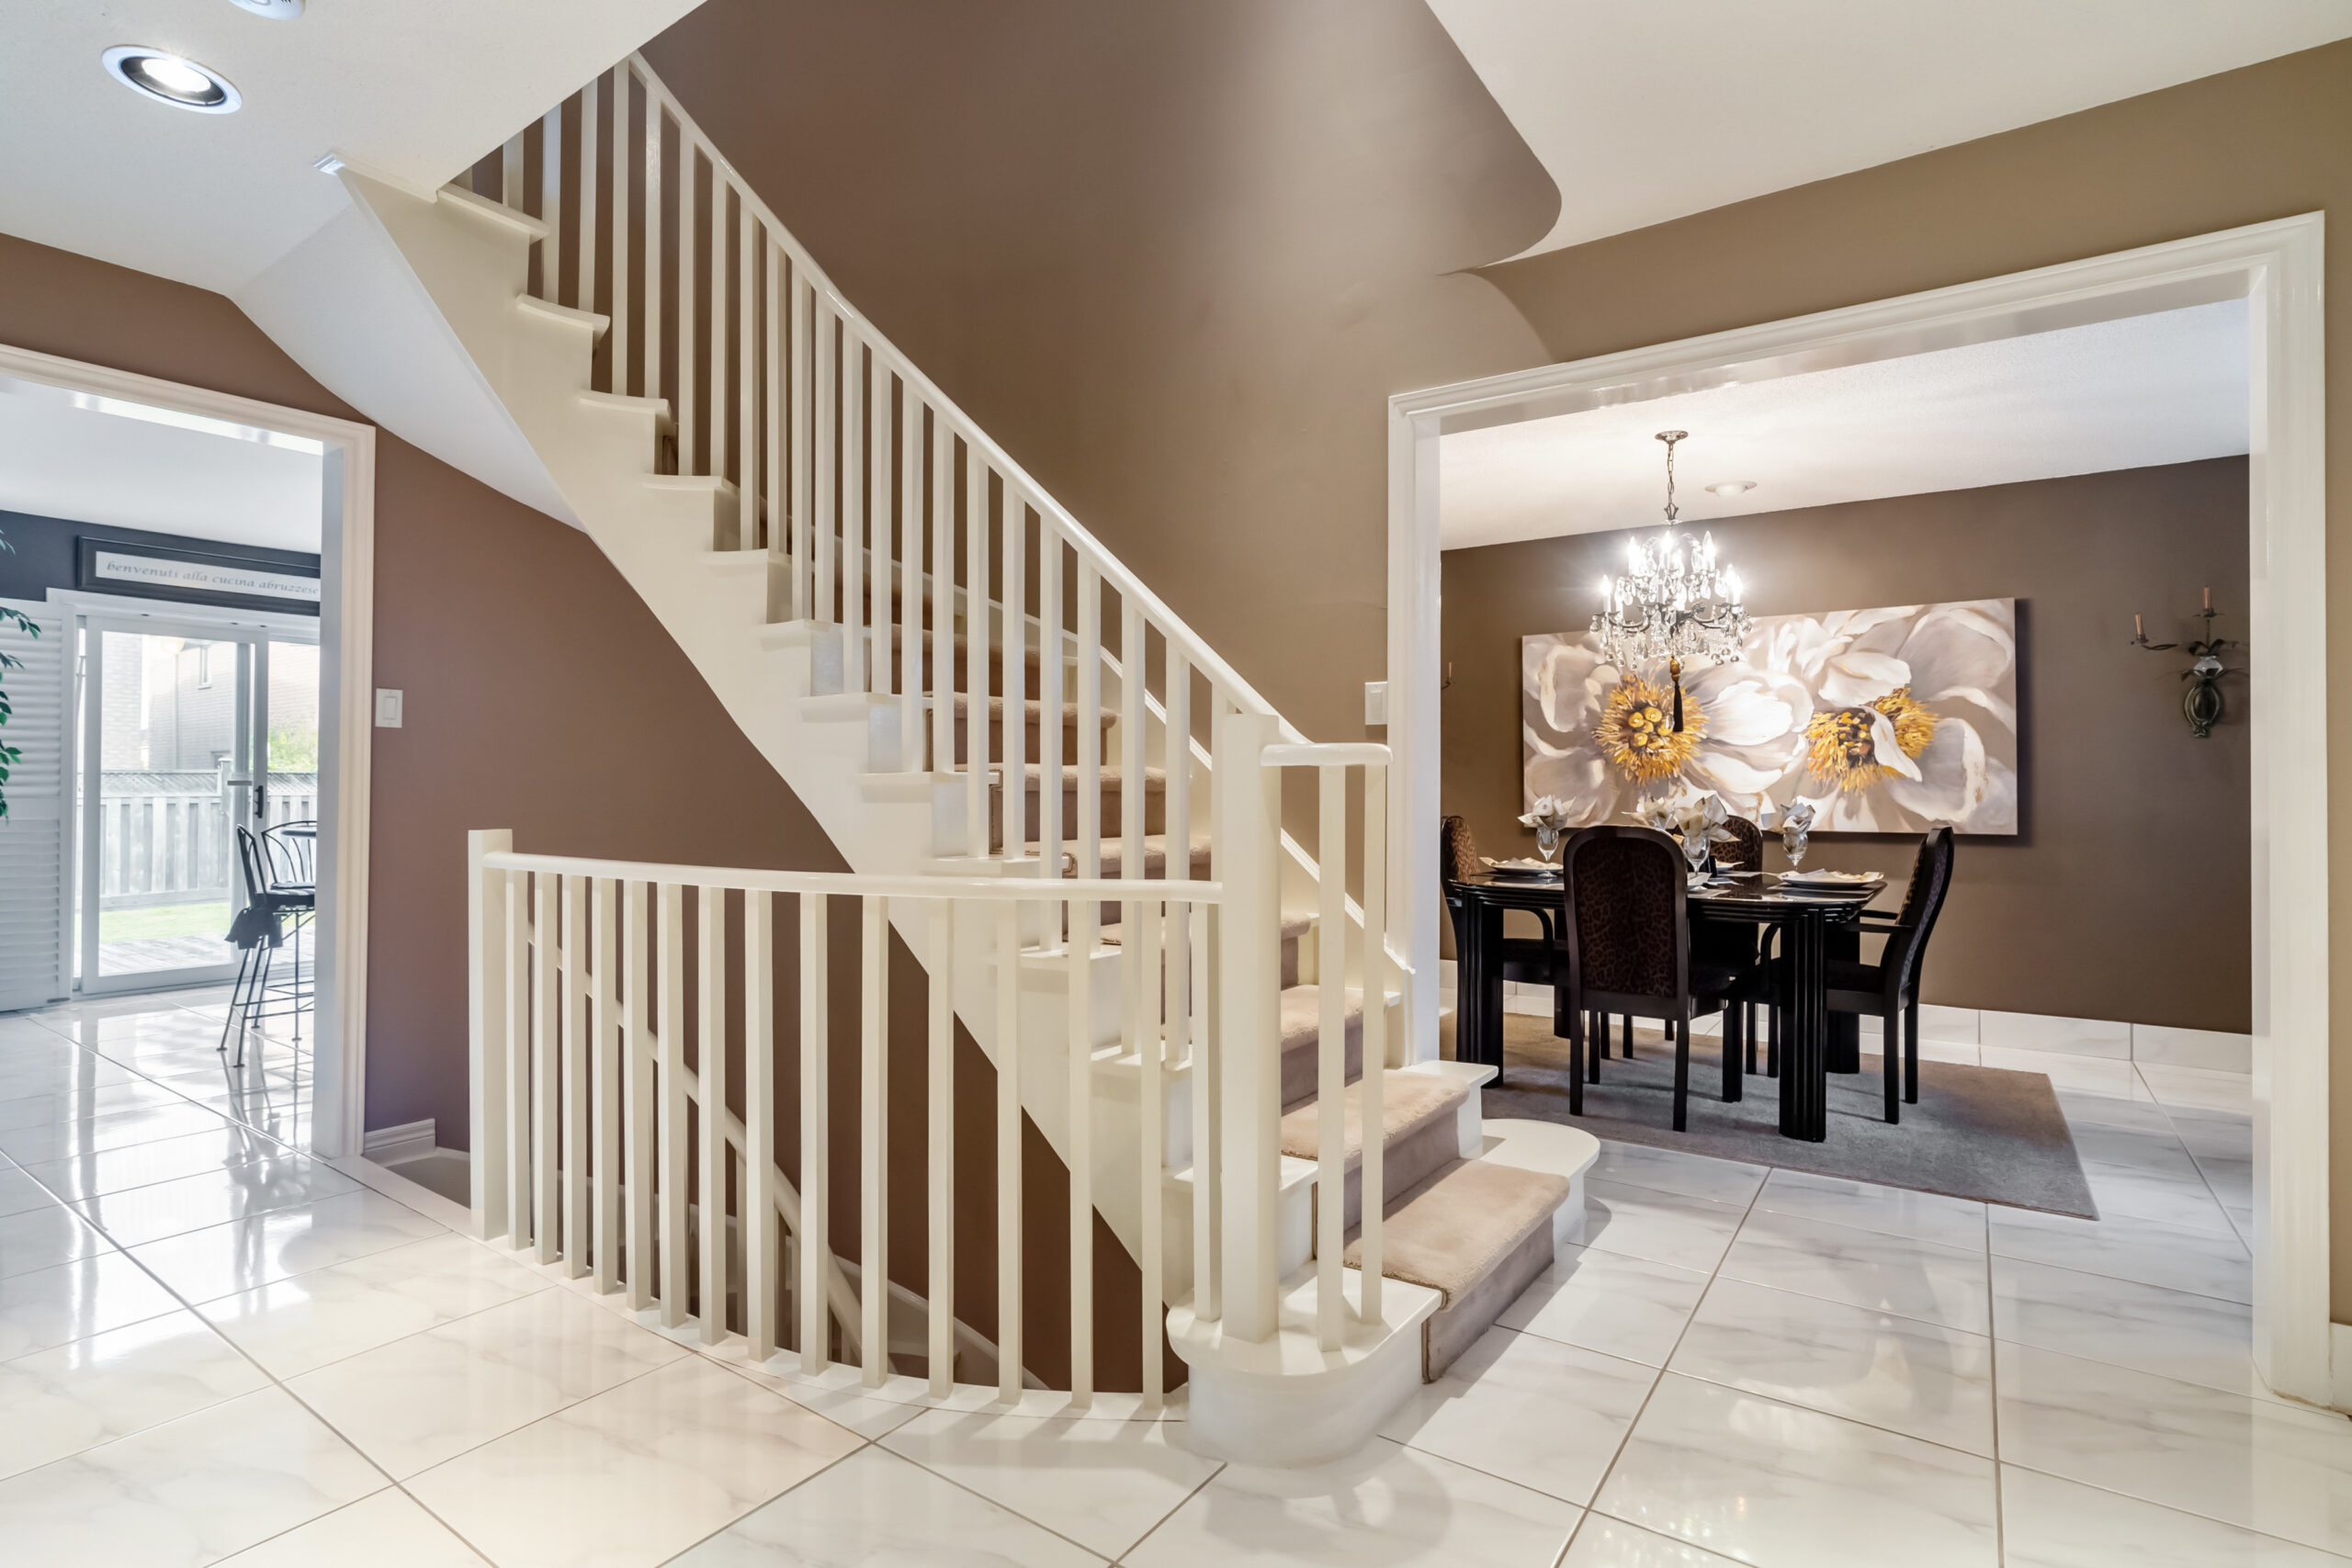 3 Stairway